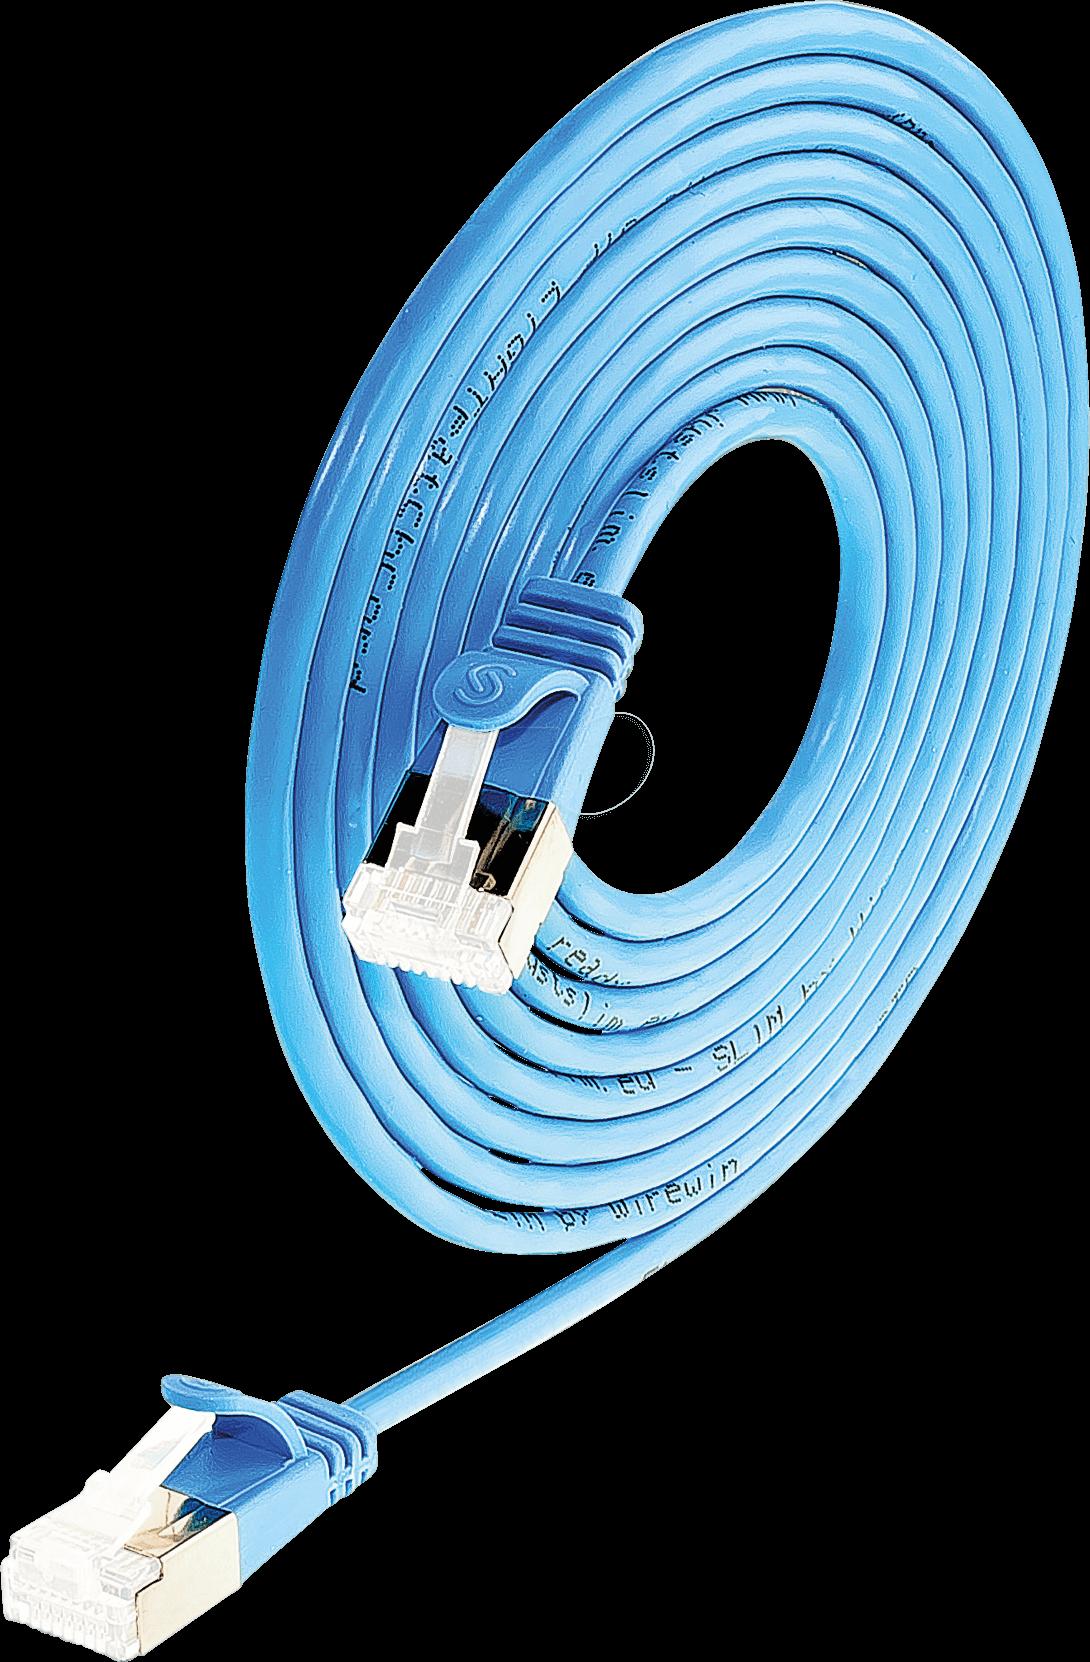 SLIM SL6A 1,5 BL - Cat.6a SLIM-Light-Kabel, U/FTP, 1,5 m, blau